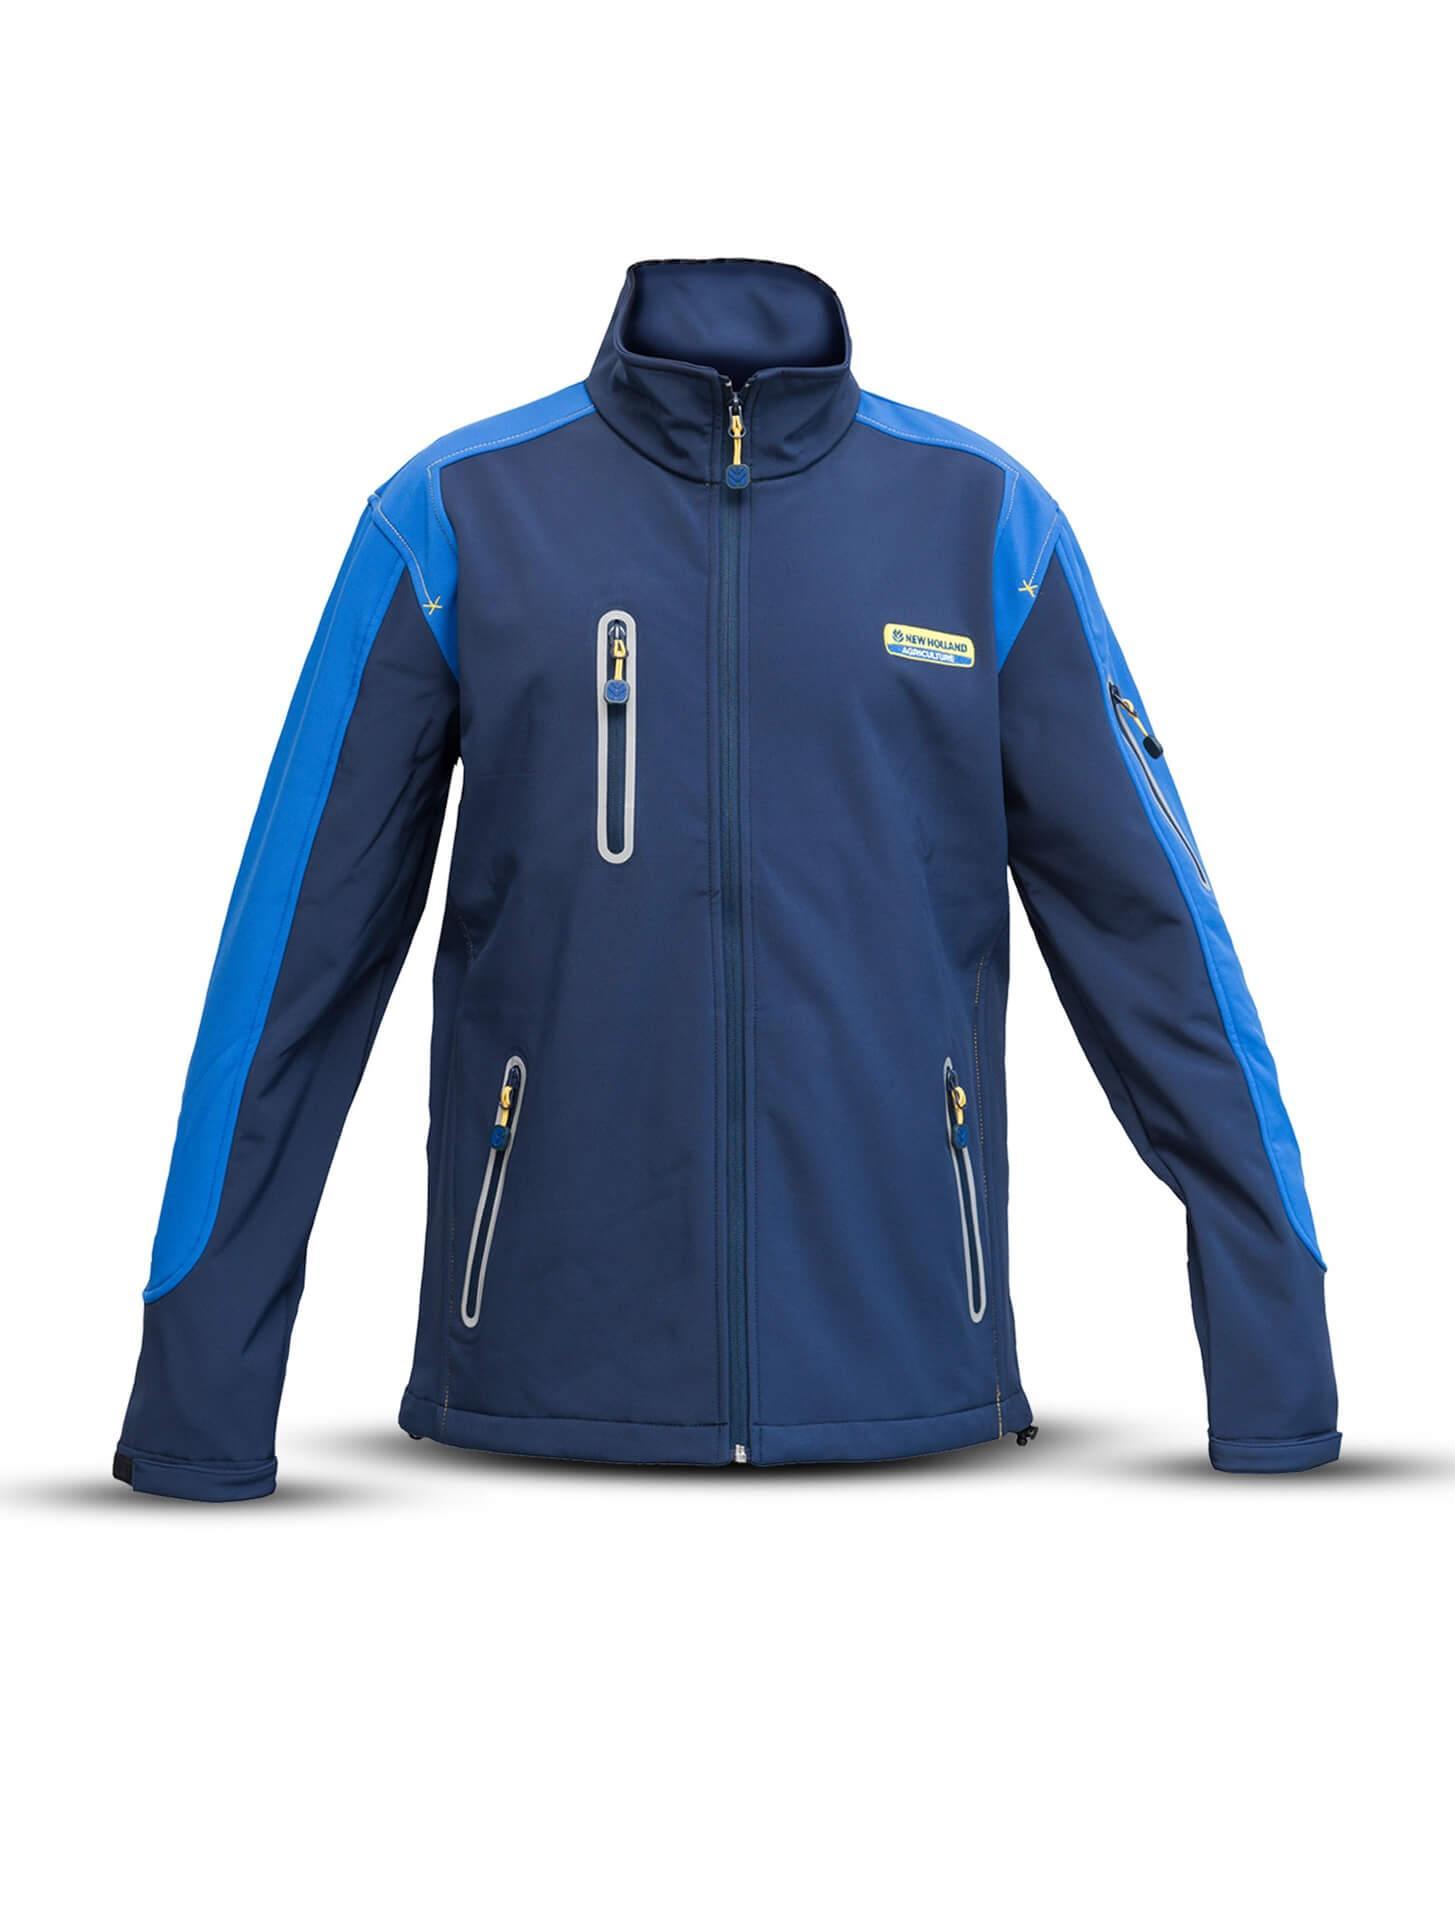 0002675 softshell jacket